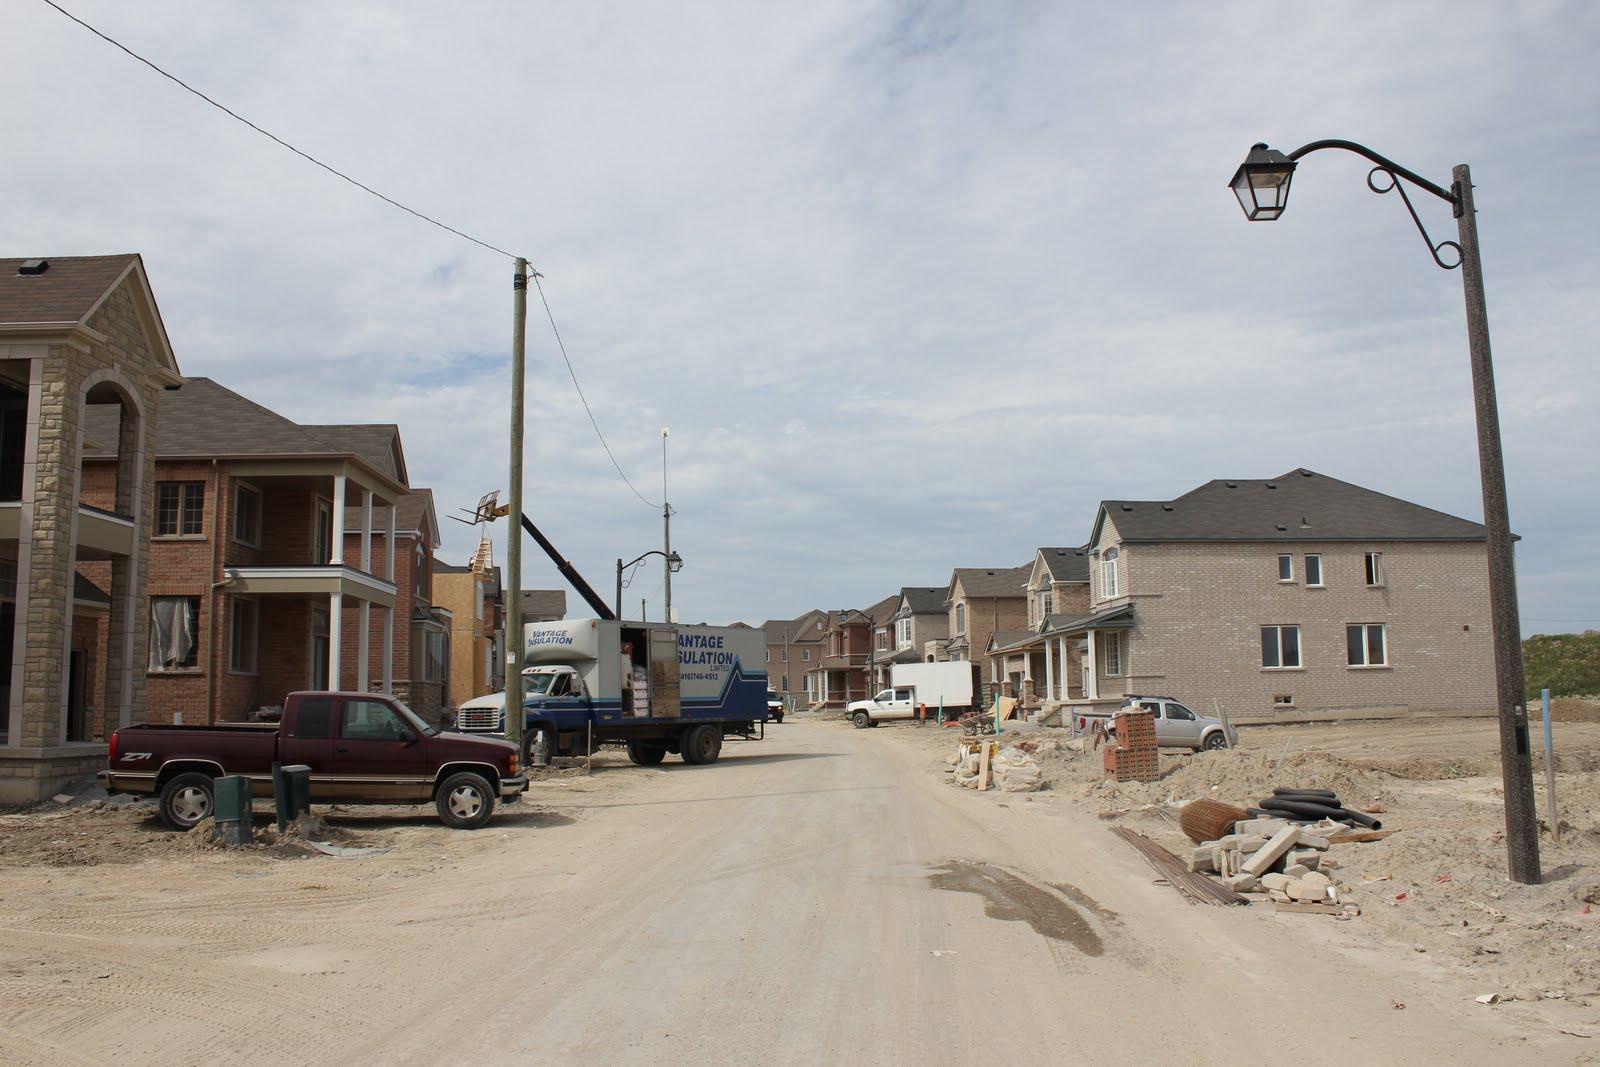 Greensborough: Construction update from Markham » Fieldgate Homes Blog